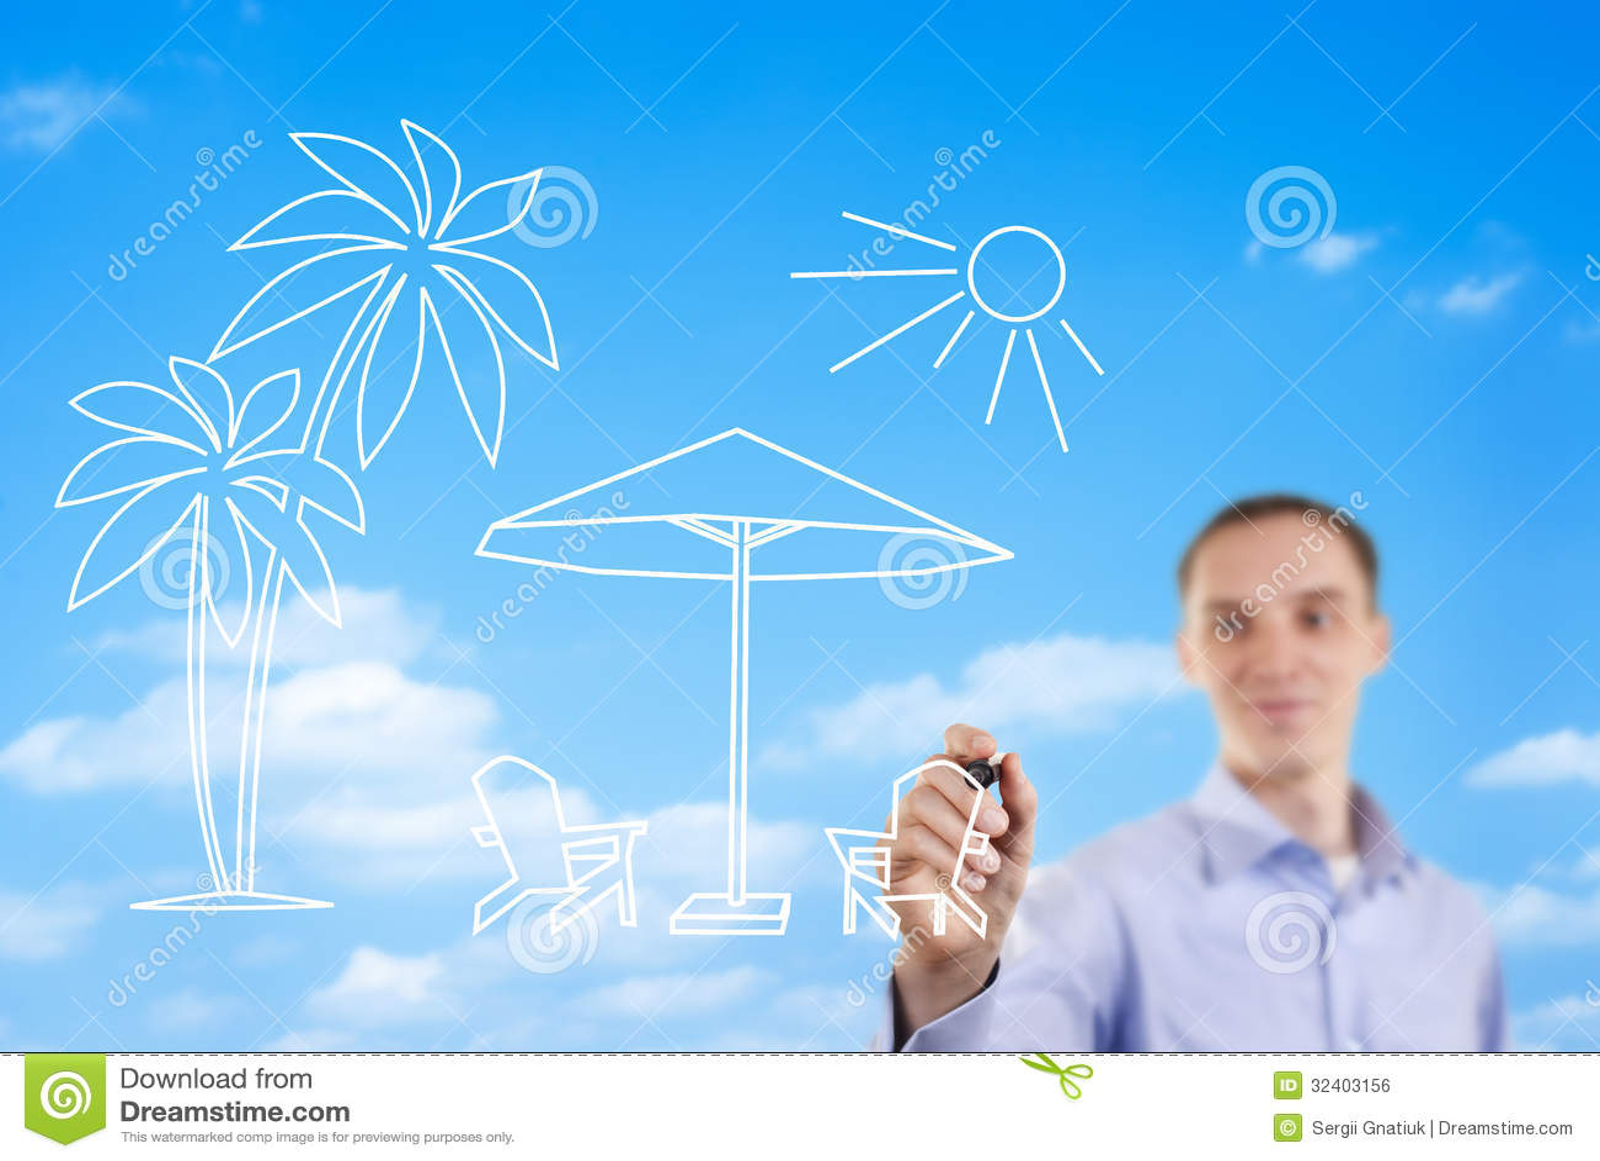 Man drawing a summer beach scene